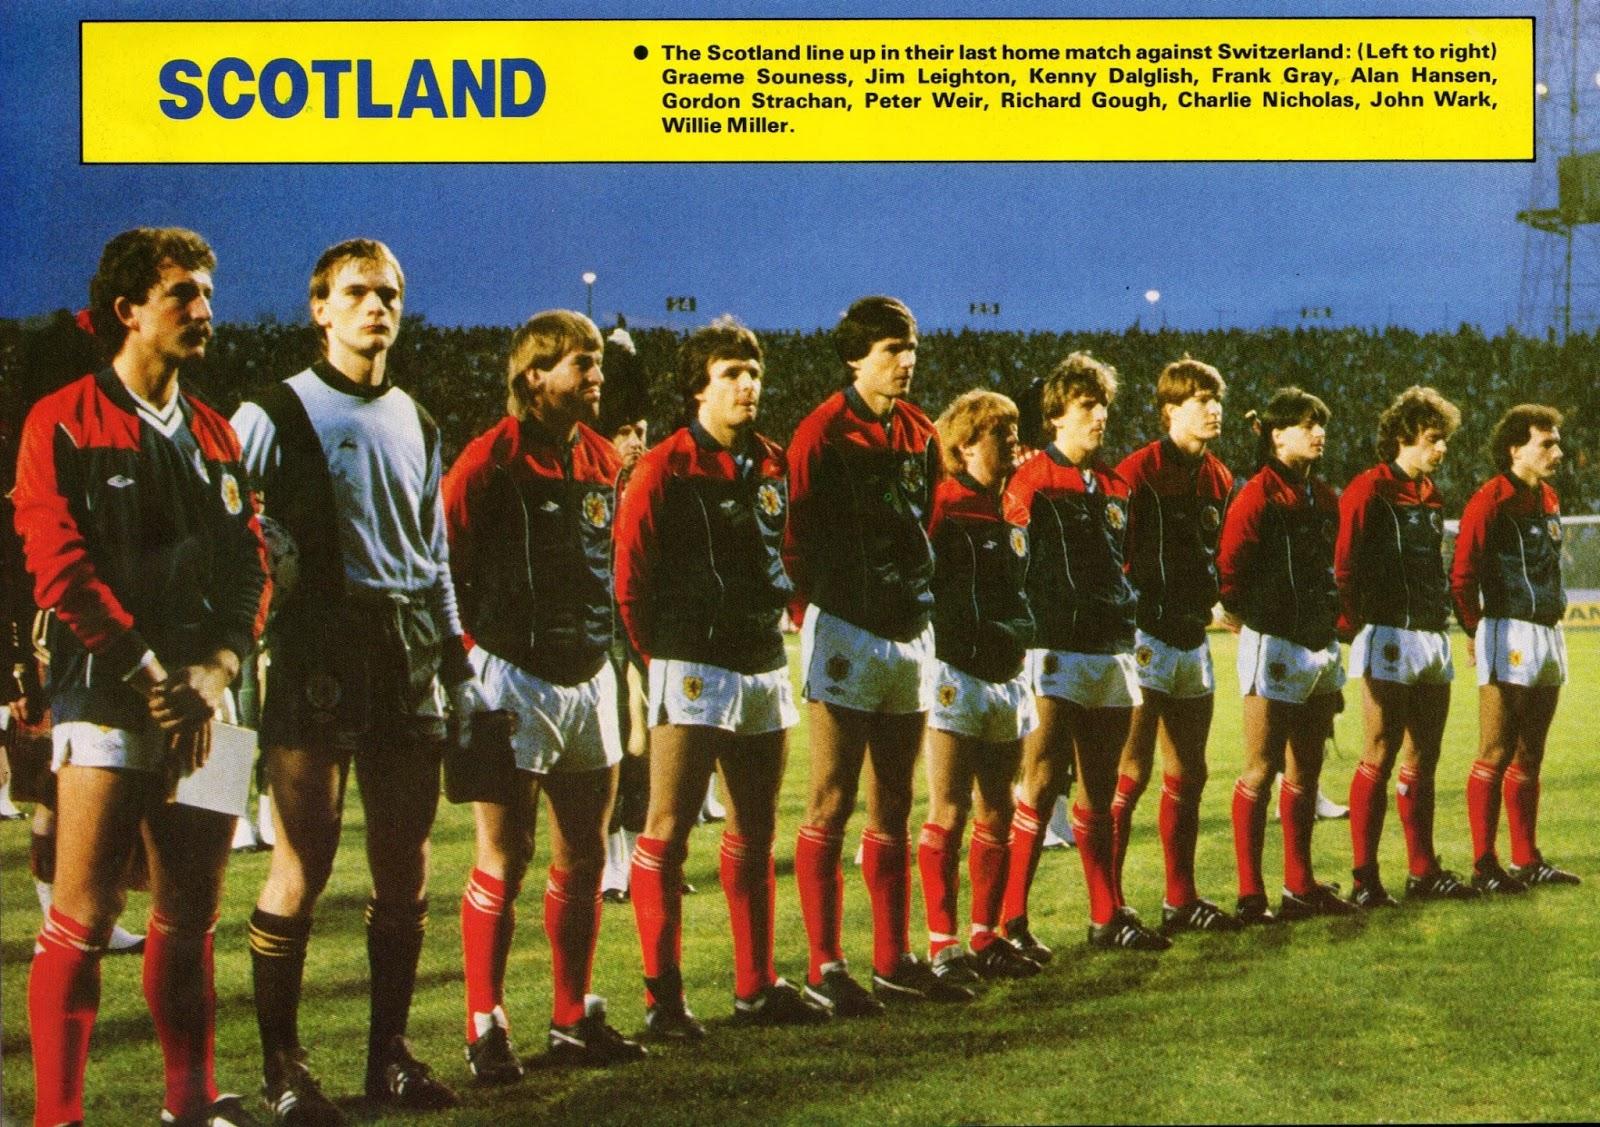 1983 in Scotland